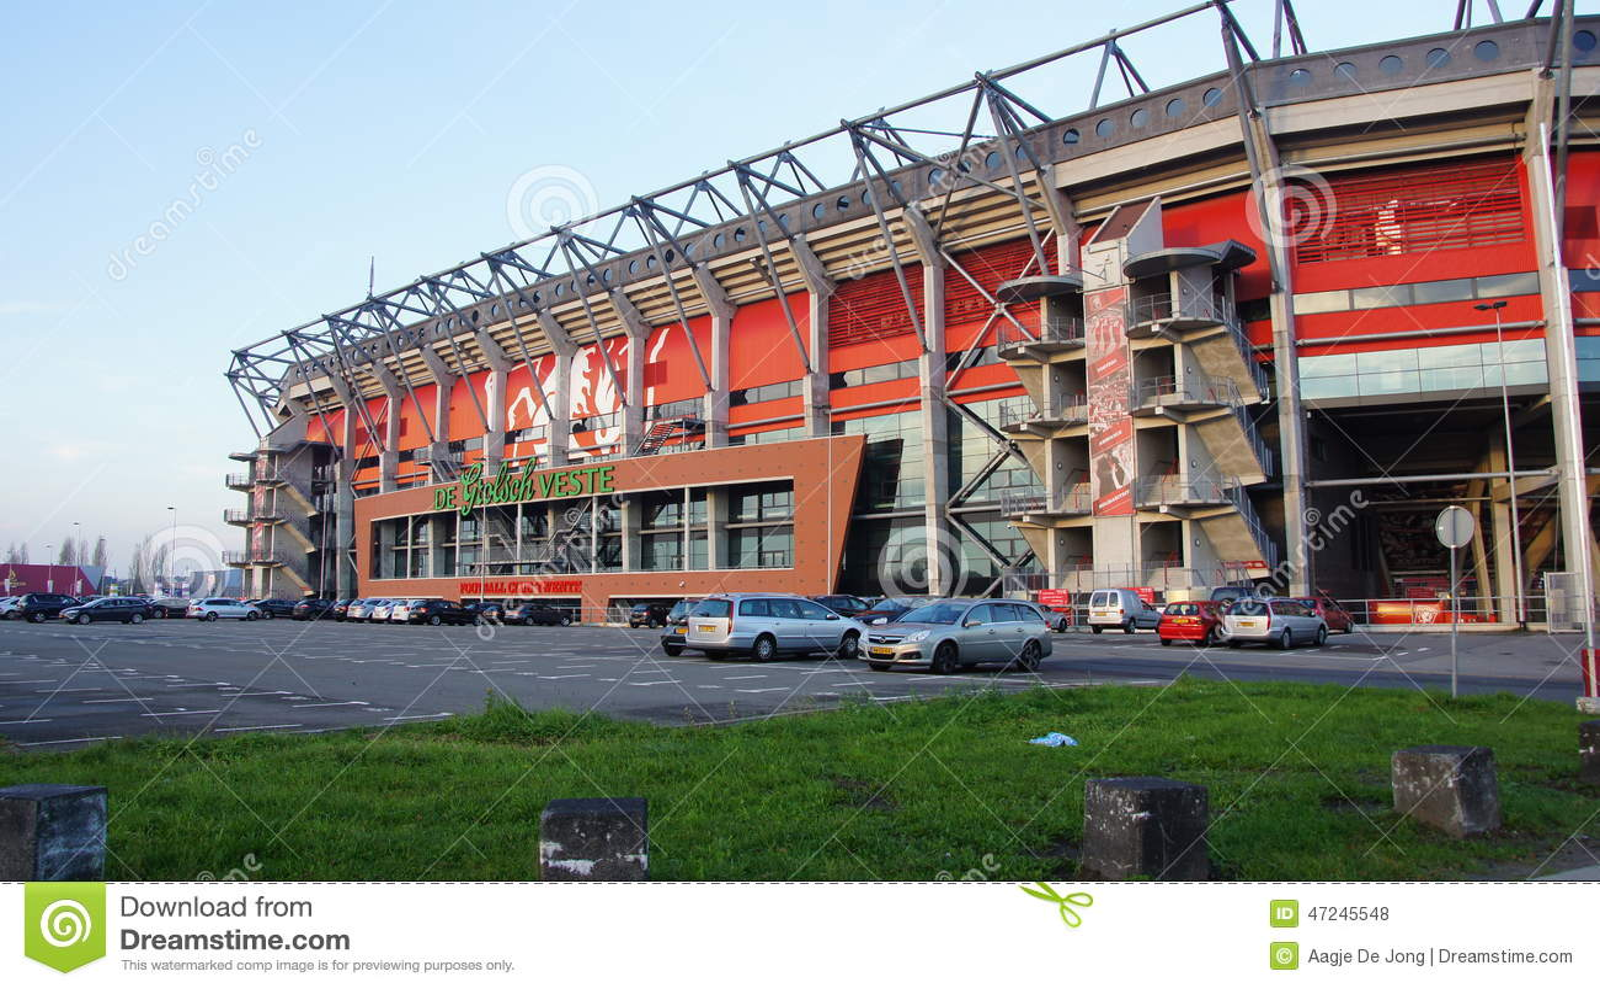 Fc Twente Football Stadium In Enschede Editorial Stock Photo Image Of Overijssel Veste 47245548